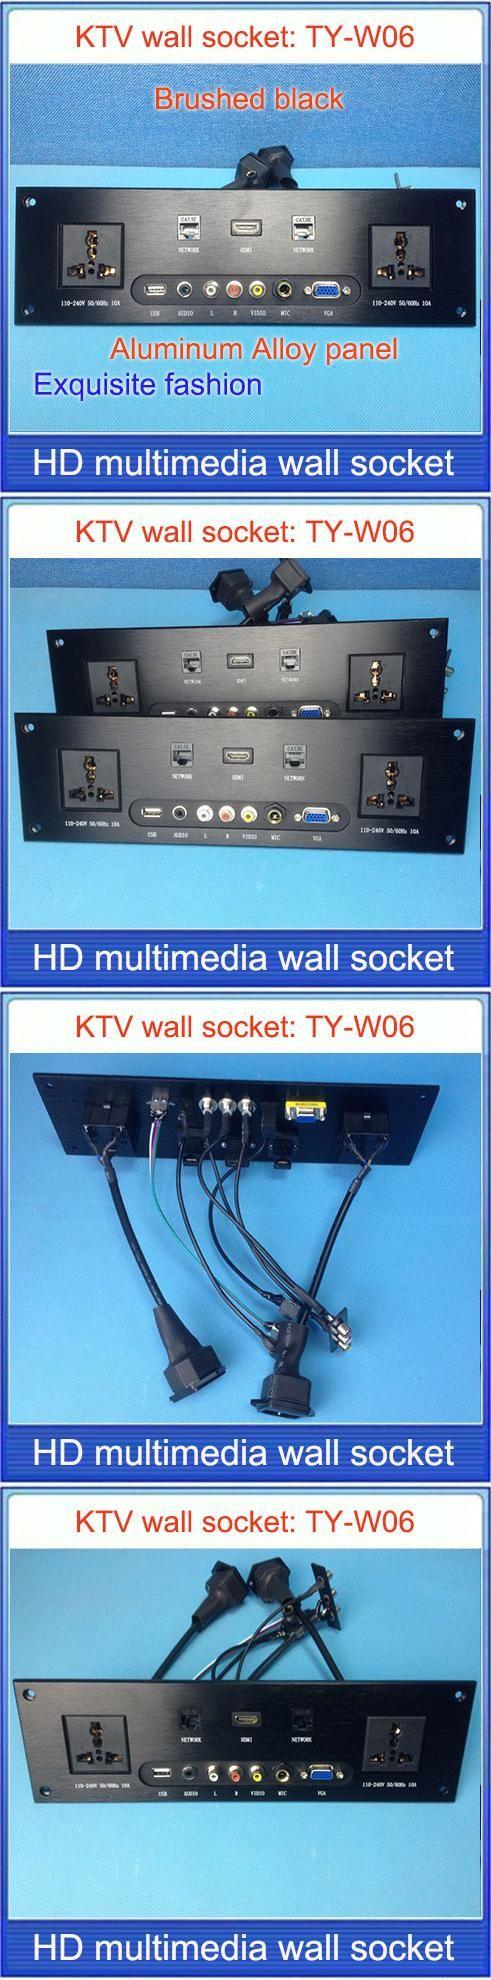 wall socket \ HD HDMI \ VGA USB NETWORK  RJ45 Video information outlet panel /multimedia home hotel rooms KTV wall socket TY-W06